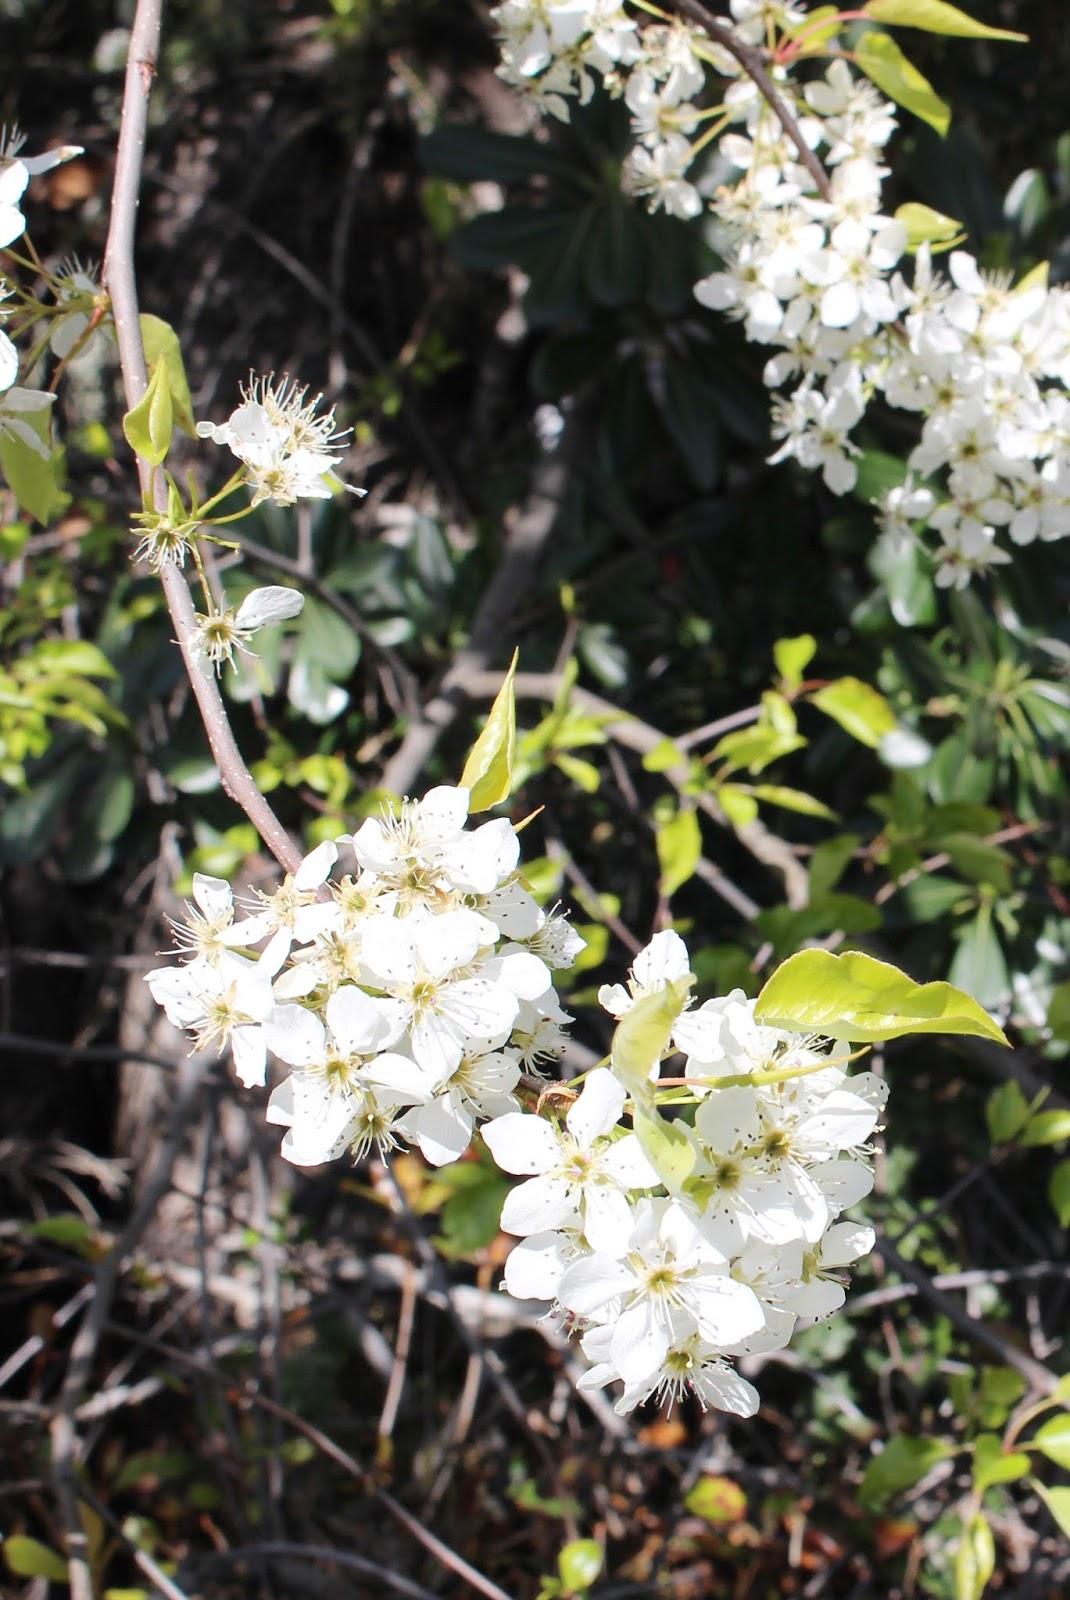 Floral Days: My Spring Bucket List